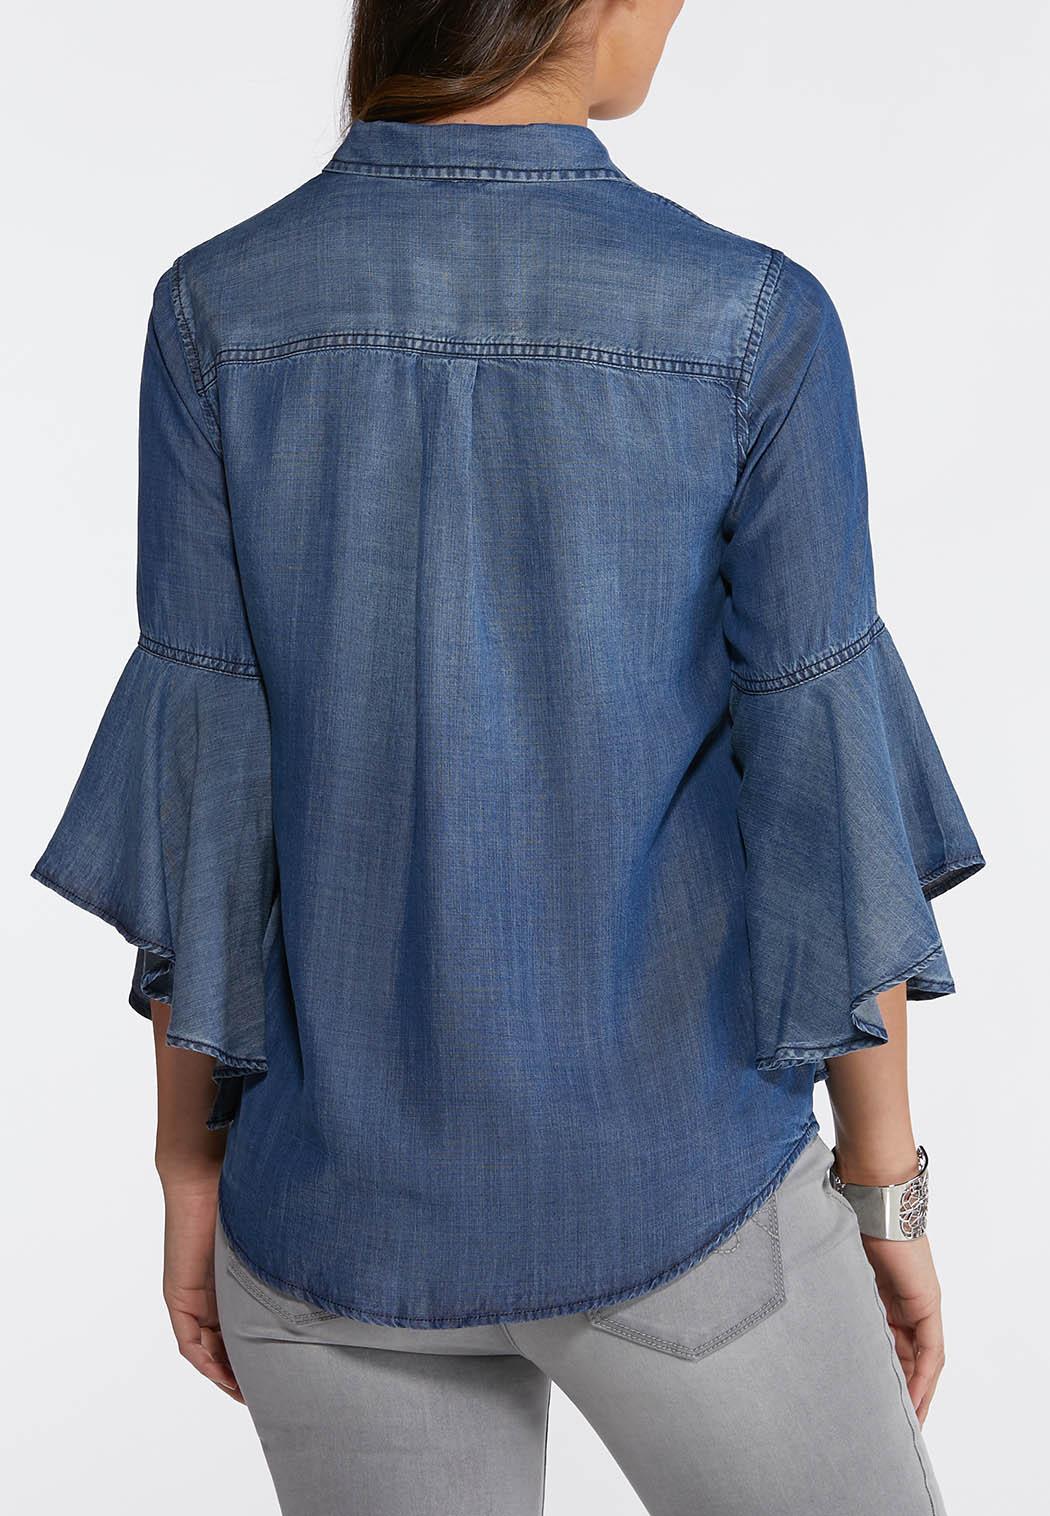 439985cabcf Plus Size Chambray Ruffled Sleeve Shirt Shirts Cato Fashions